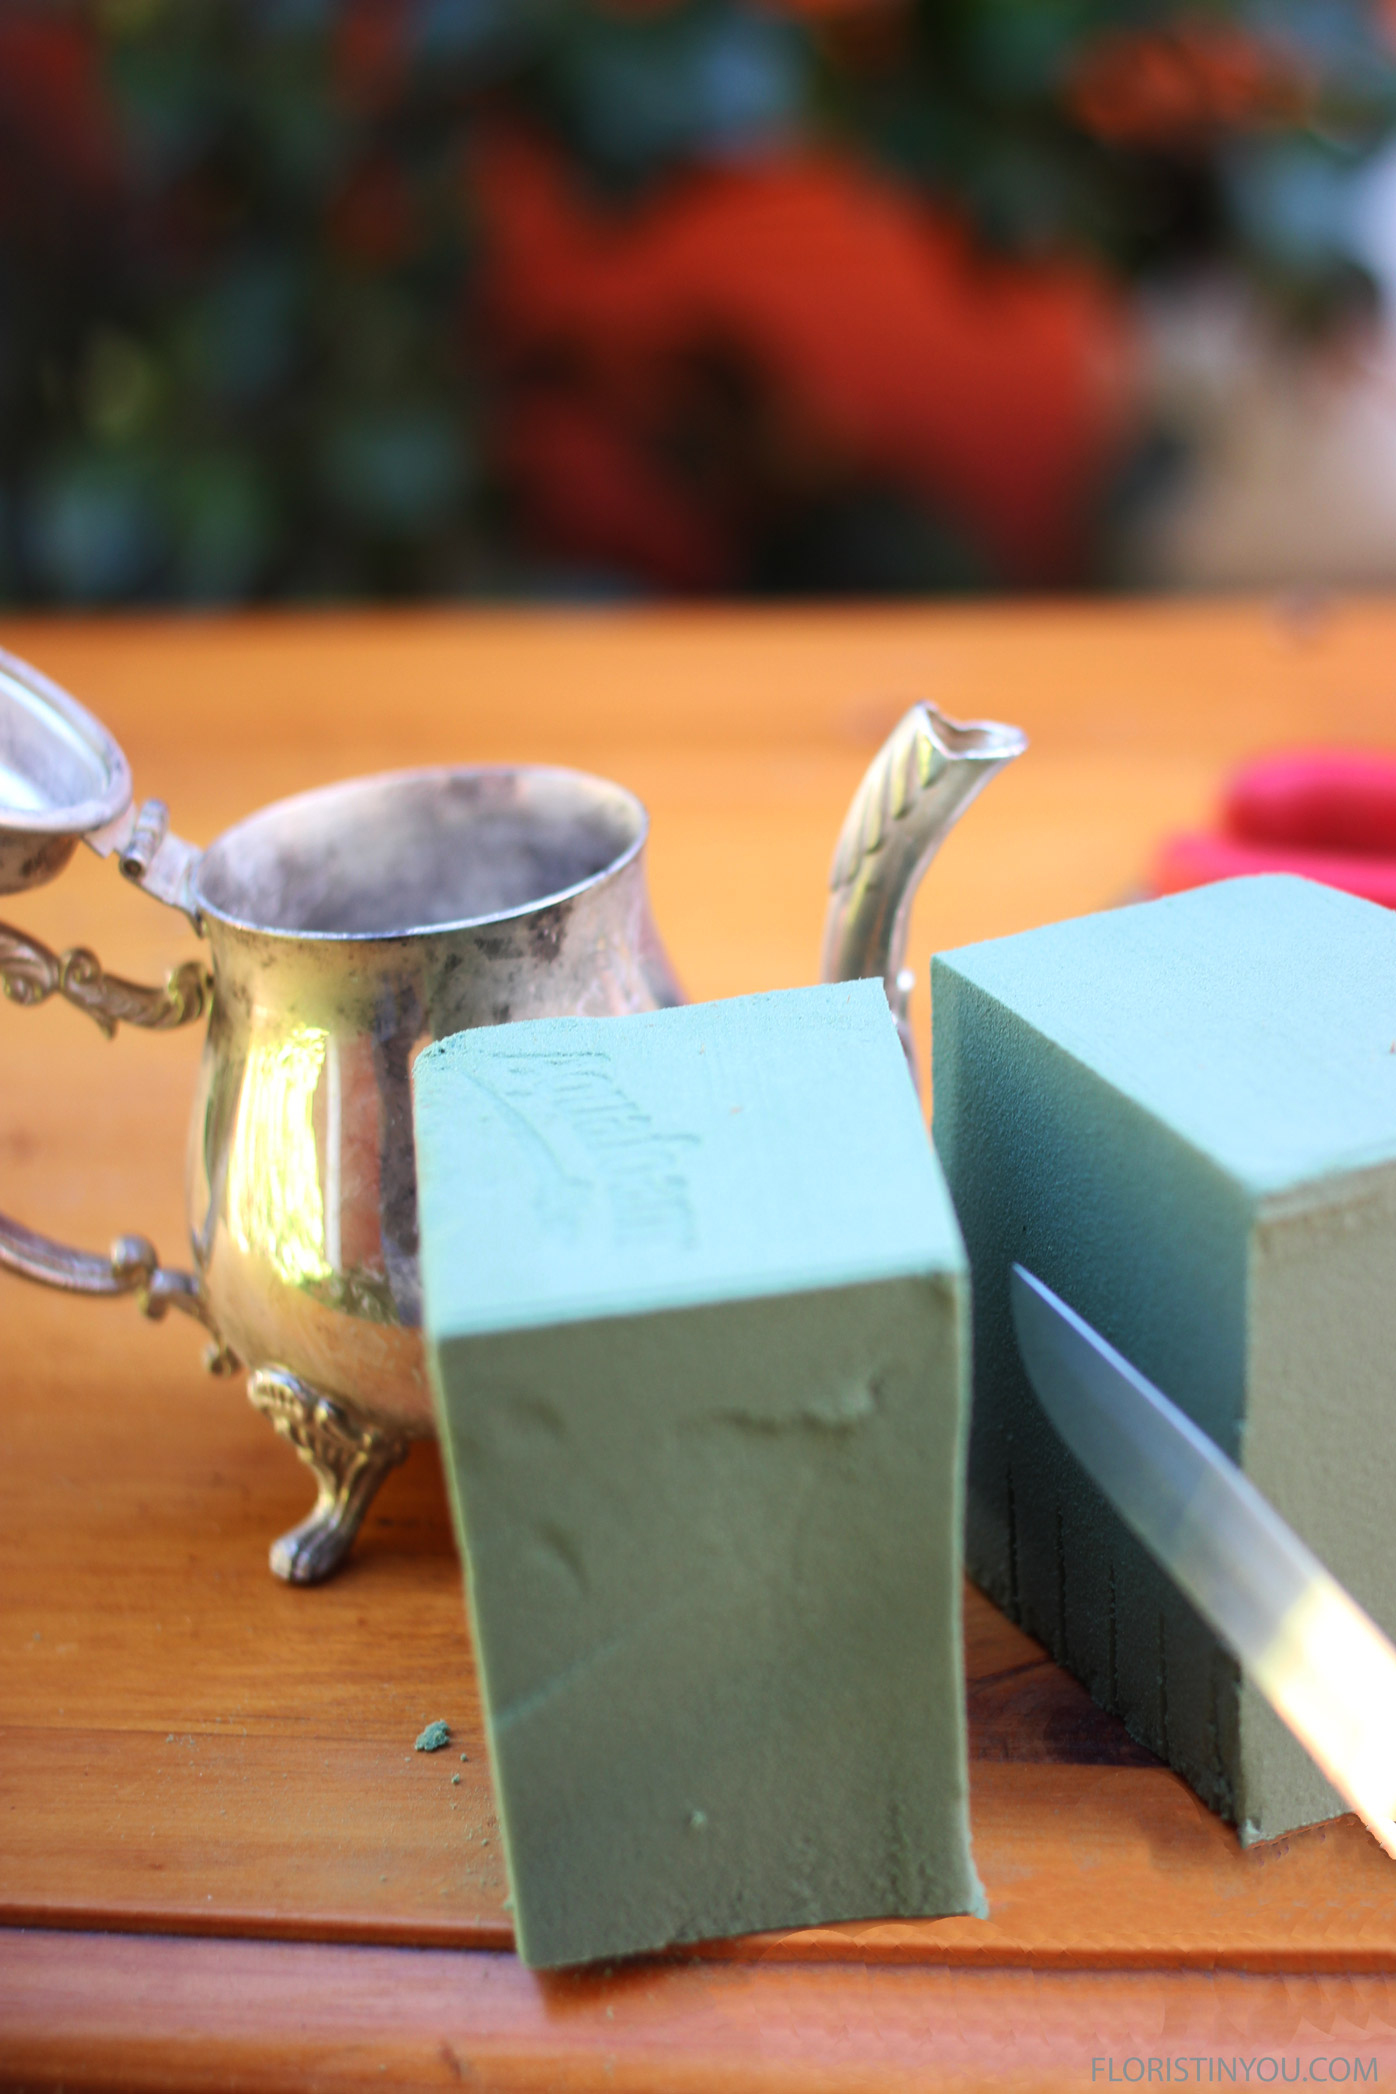 Cut last 1/3 of brick in half and shape for tiny tea pot.